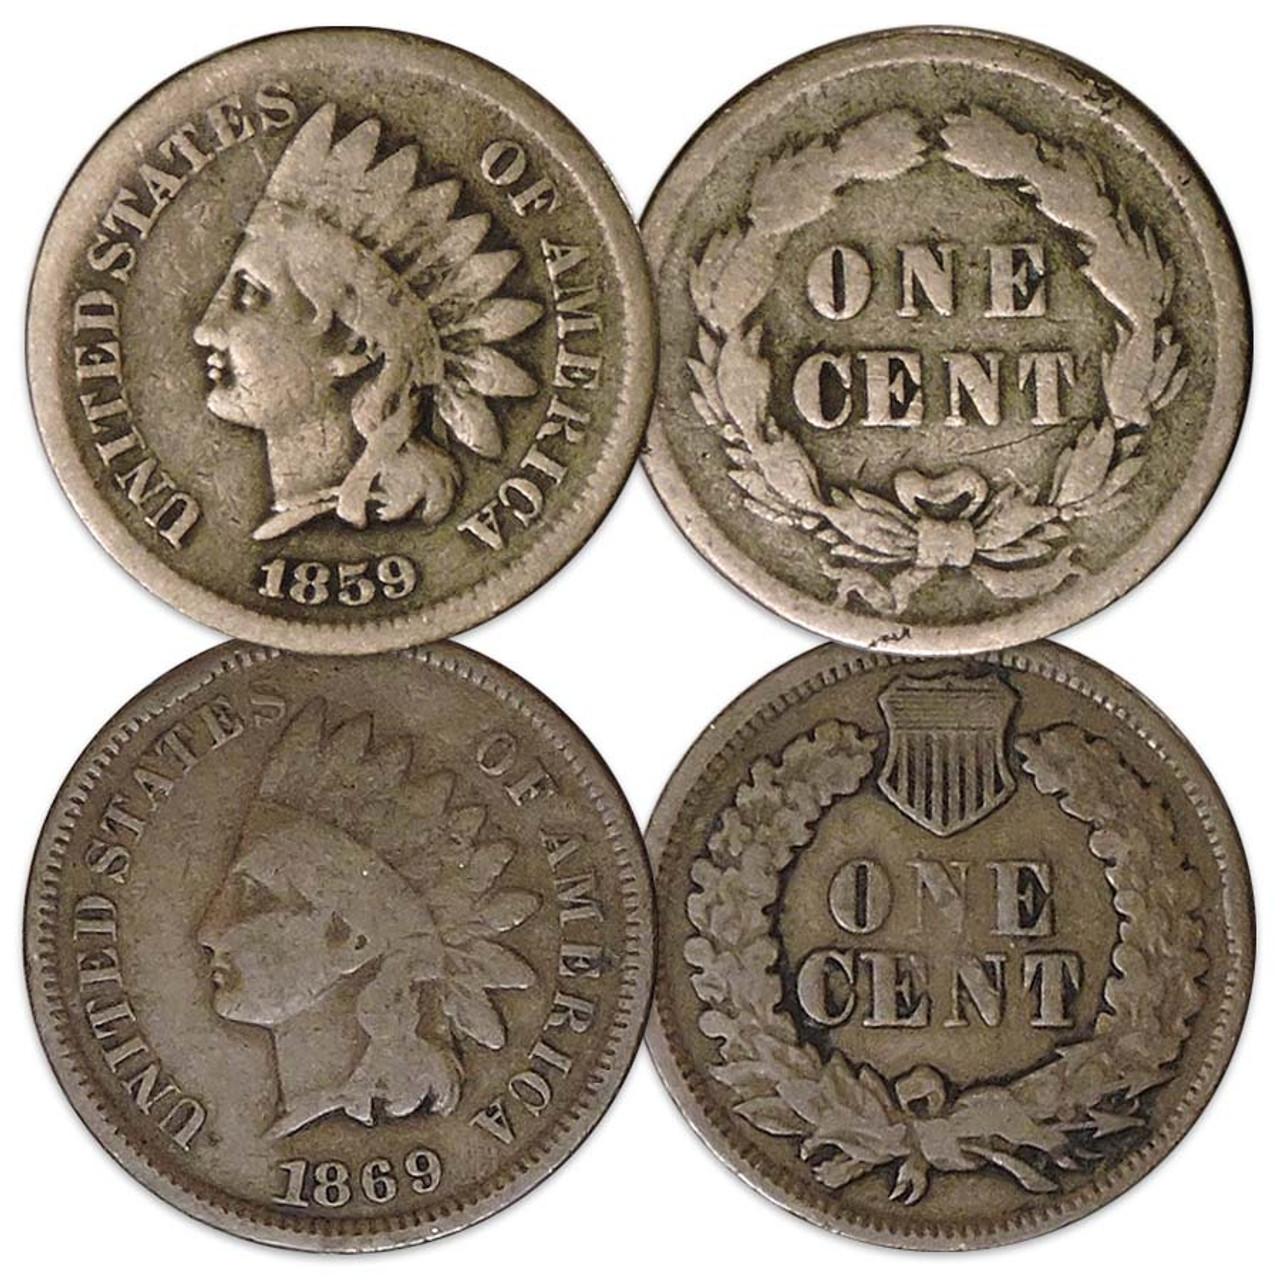 1859 & 1869 Indian Head Cent Pair Good